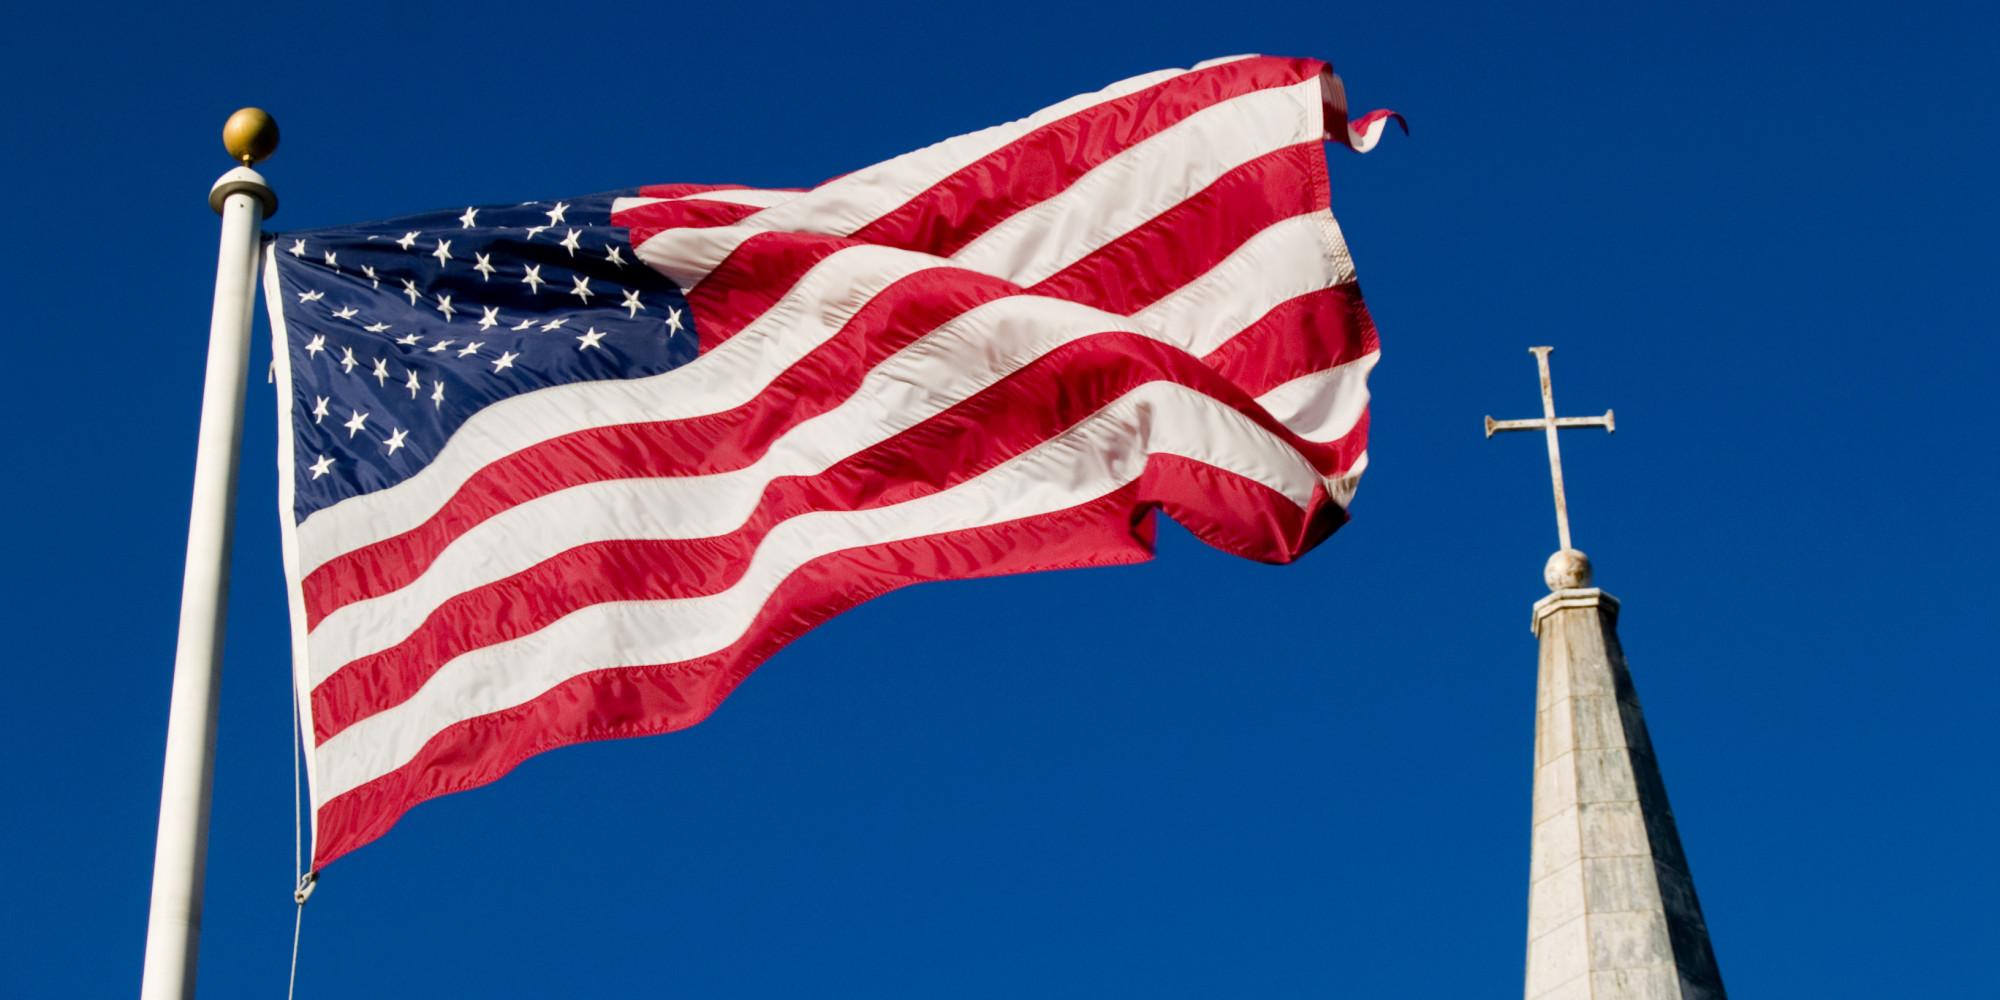 American Political Ideologies